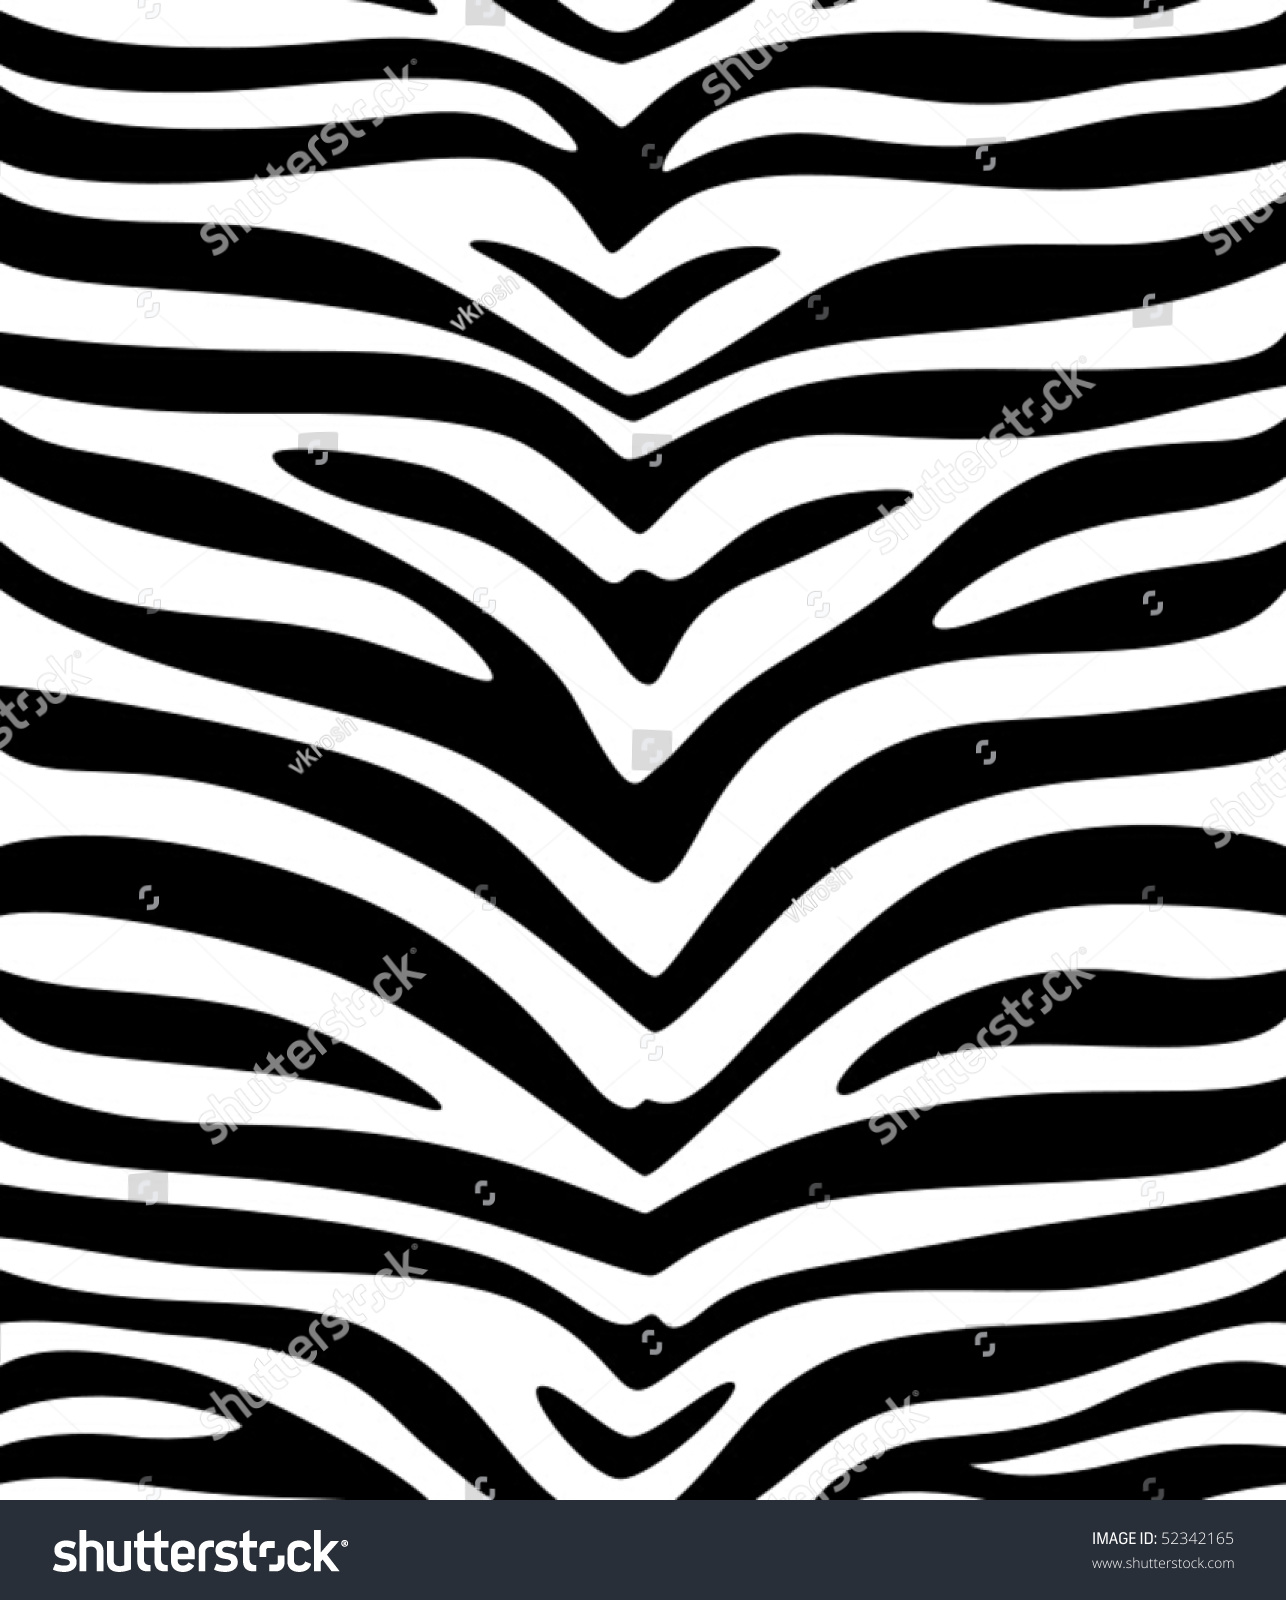 white tiger skin background - photo #14